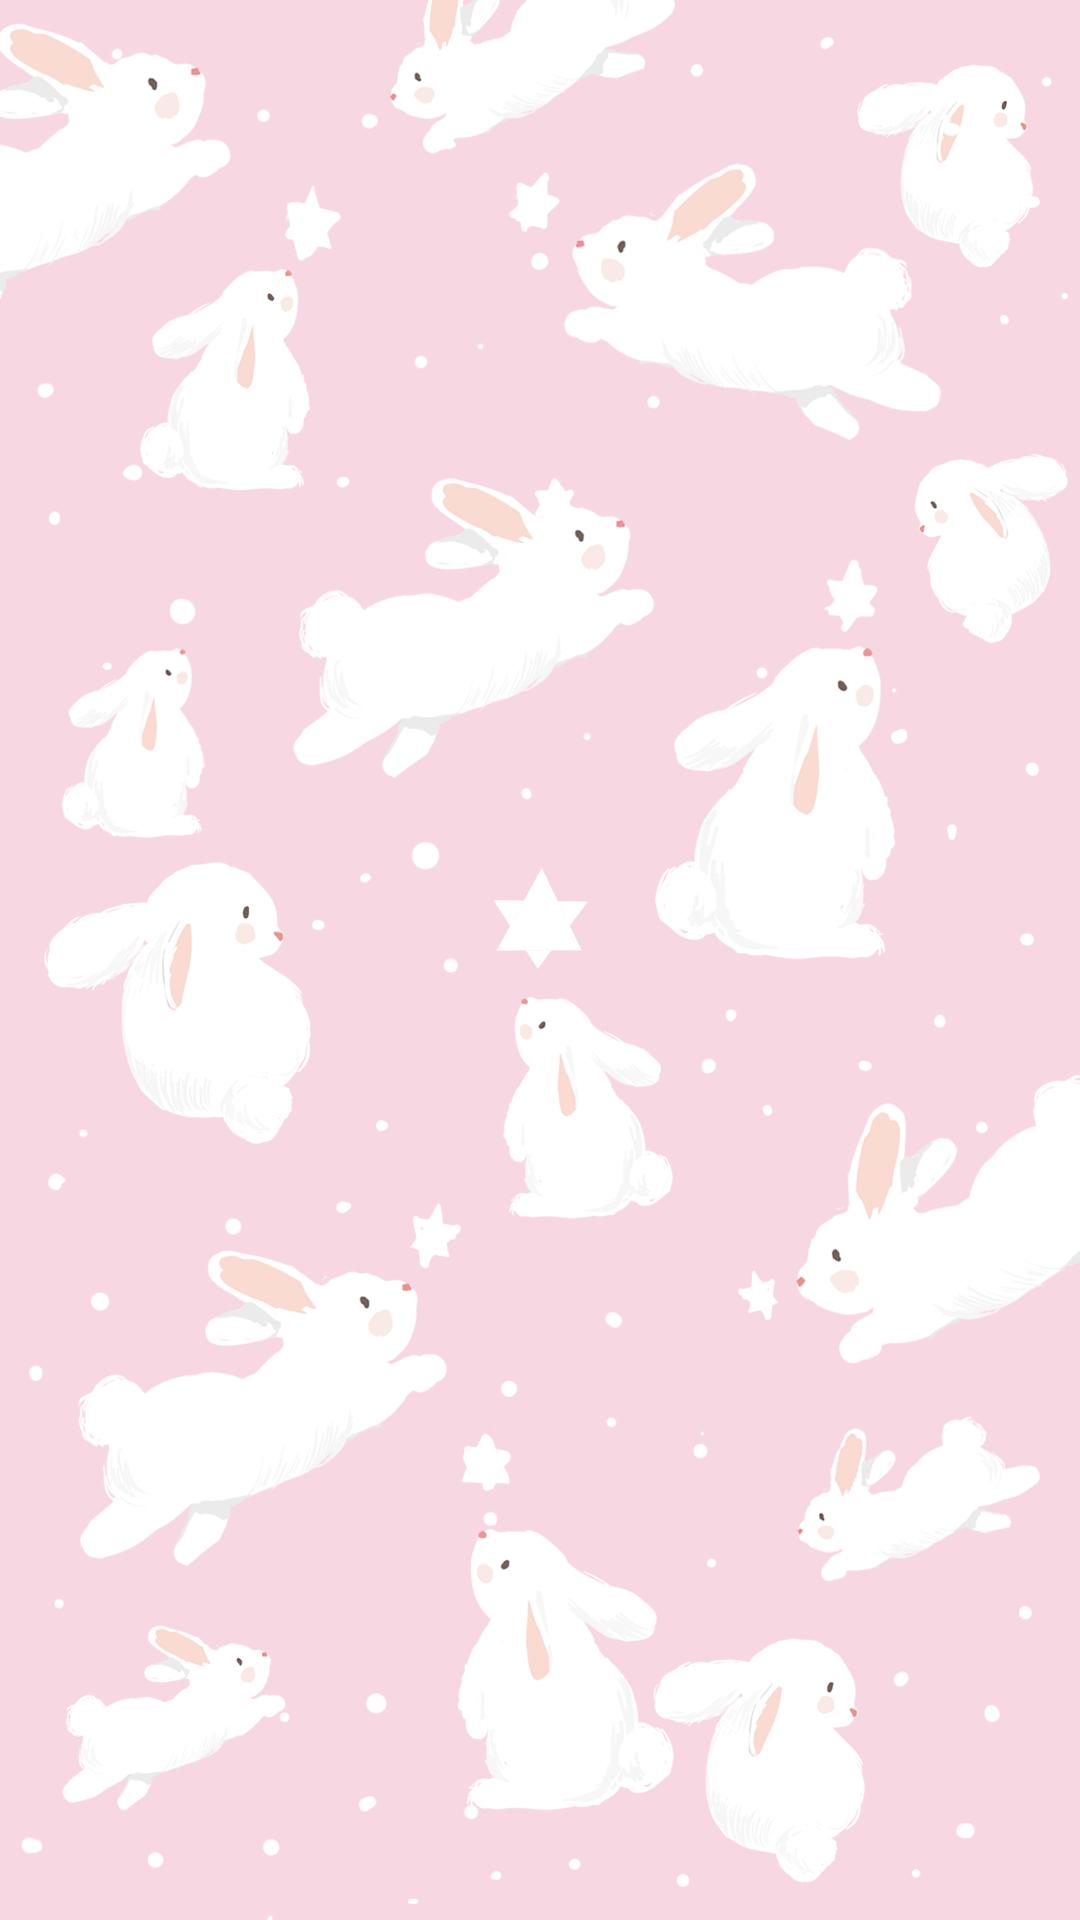 Wallpaper Coelhinho Da Pascoa Rosa By Gocase Pascoa Easter Coelho Cenoura Rabbit Blue Estrelas Cute Bunny Wallpaper Easter Wallpaper Rabbit Wallpaper